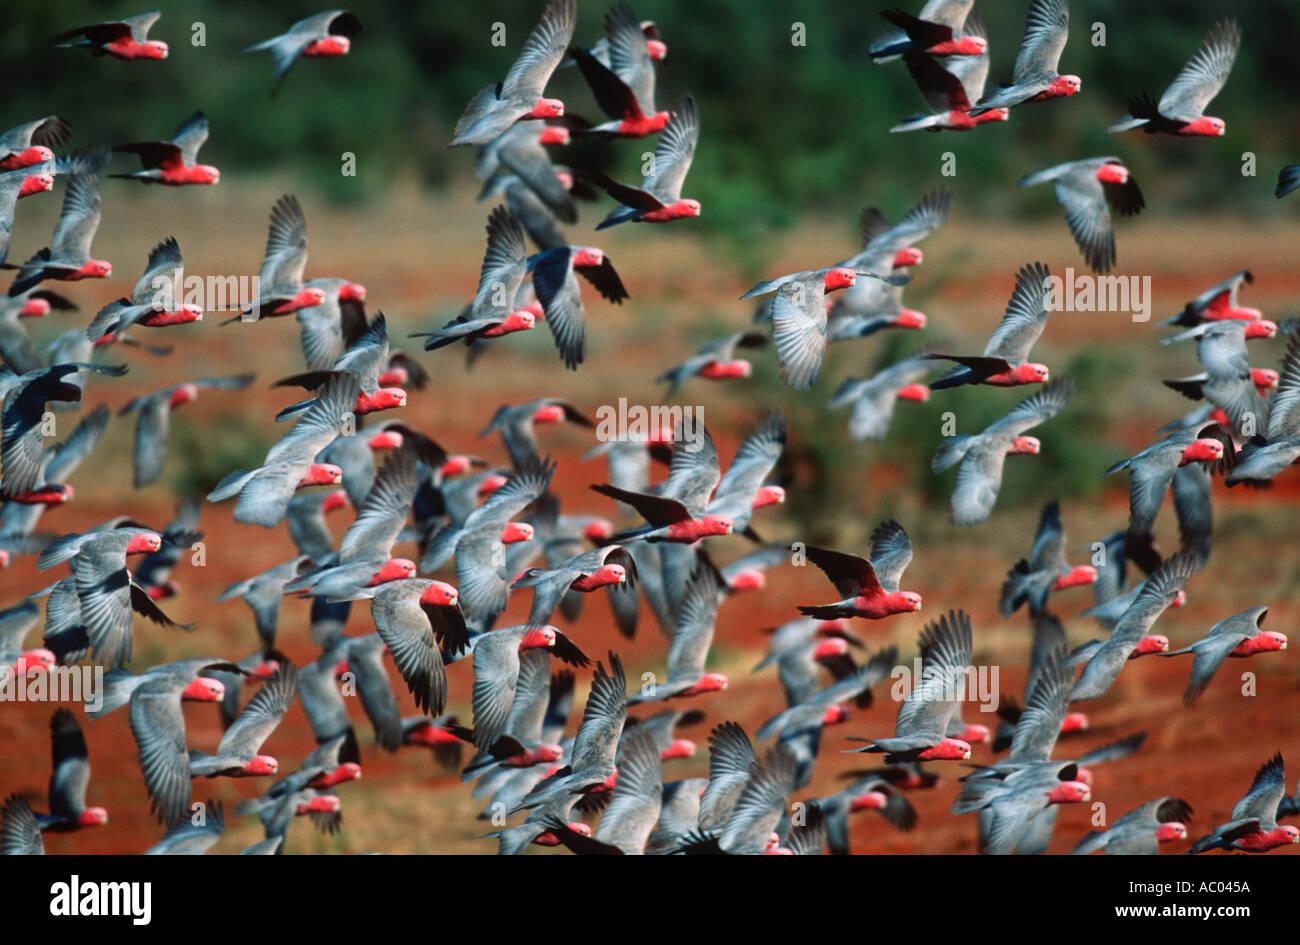 Galah Cacatua roseicapilla Usually in large noisy flocks Australia - Stock Image